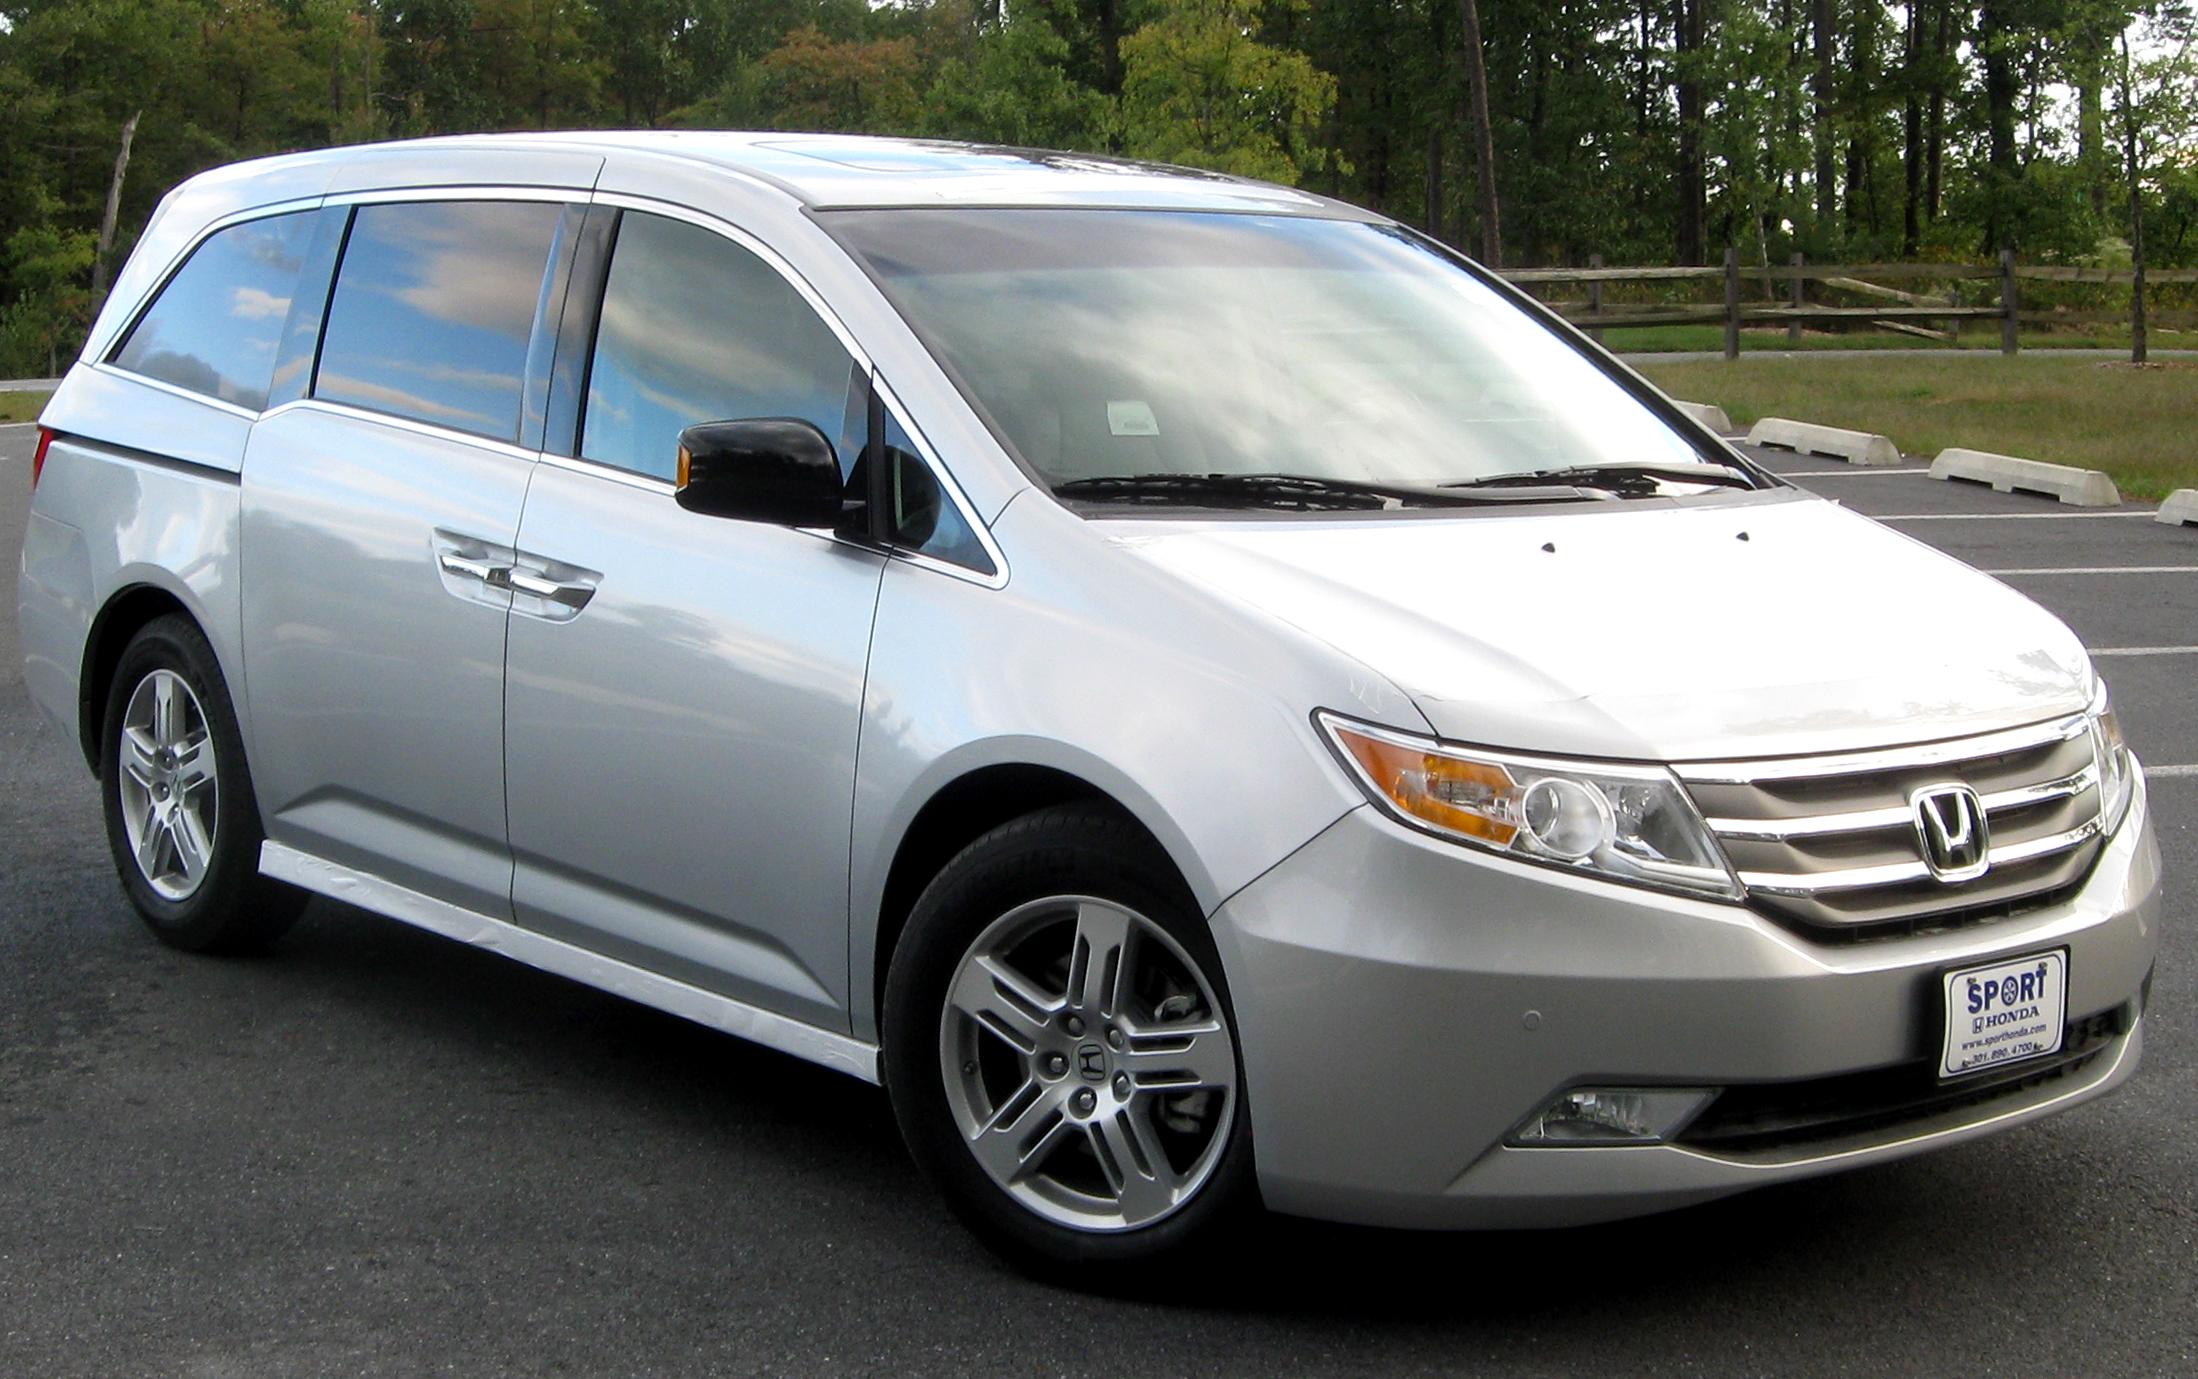 File 2011 Honda Odyssey Touring Elite 10 06 2010 Jpg Wikimedia Commons